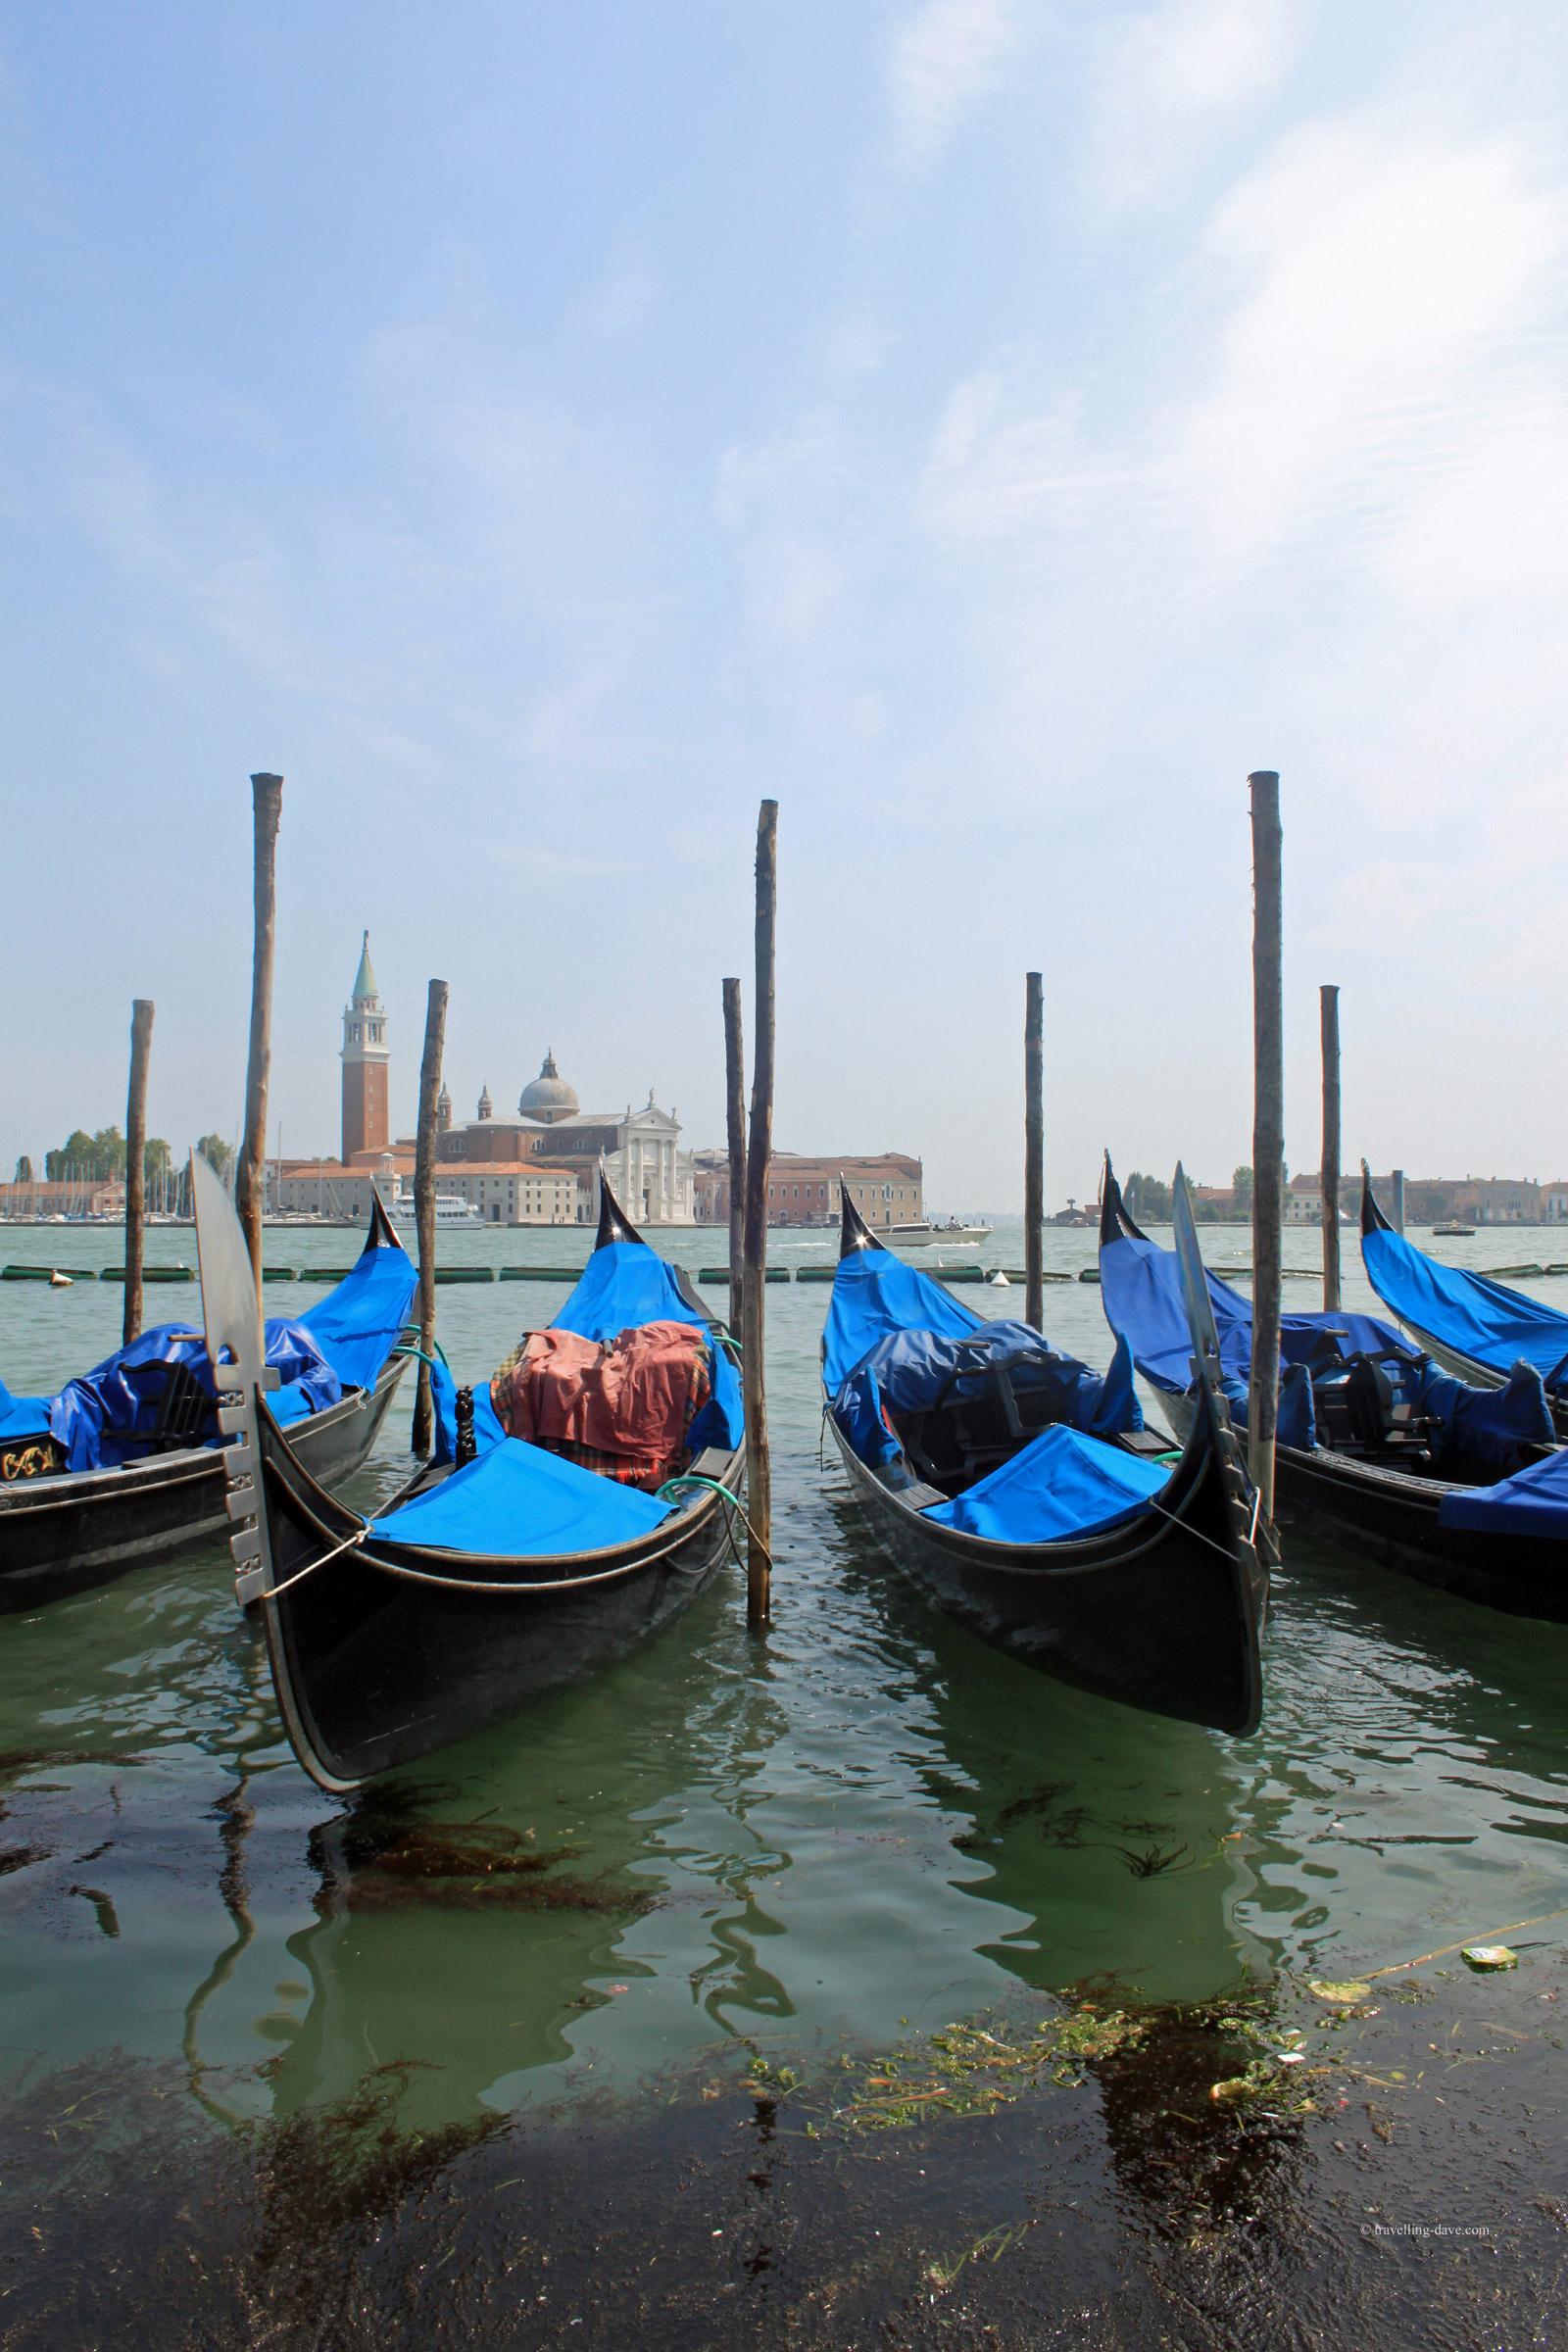 View of four gondolas in Venice